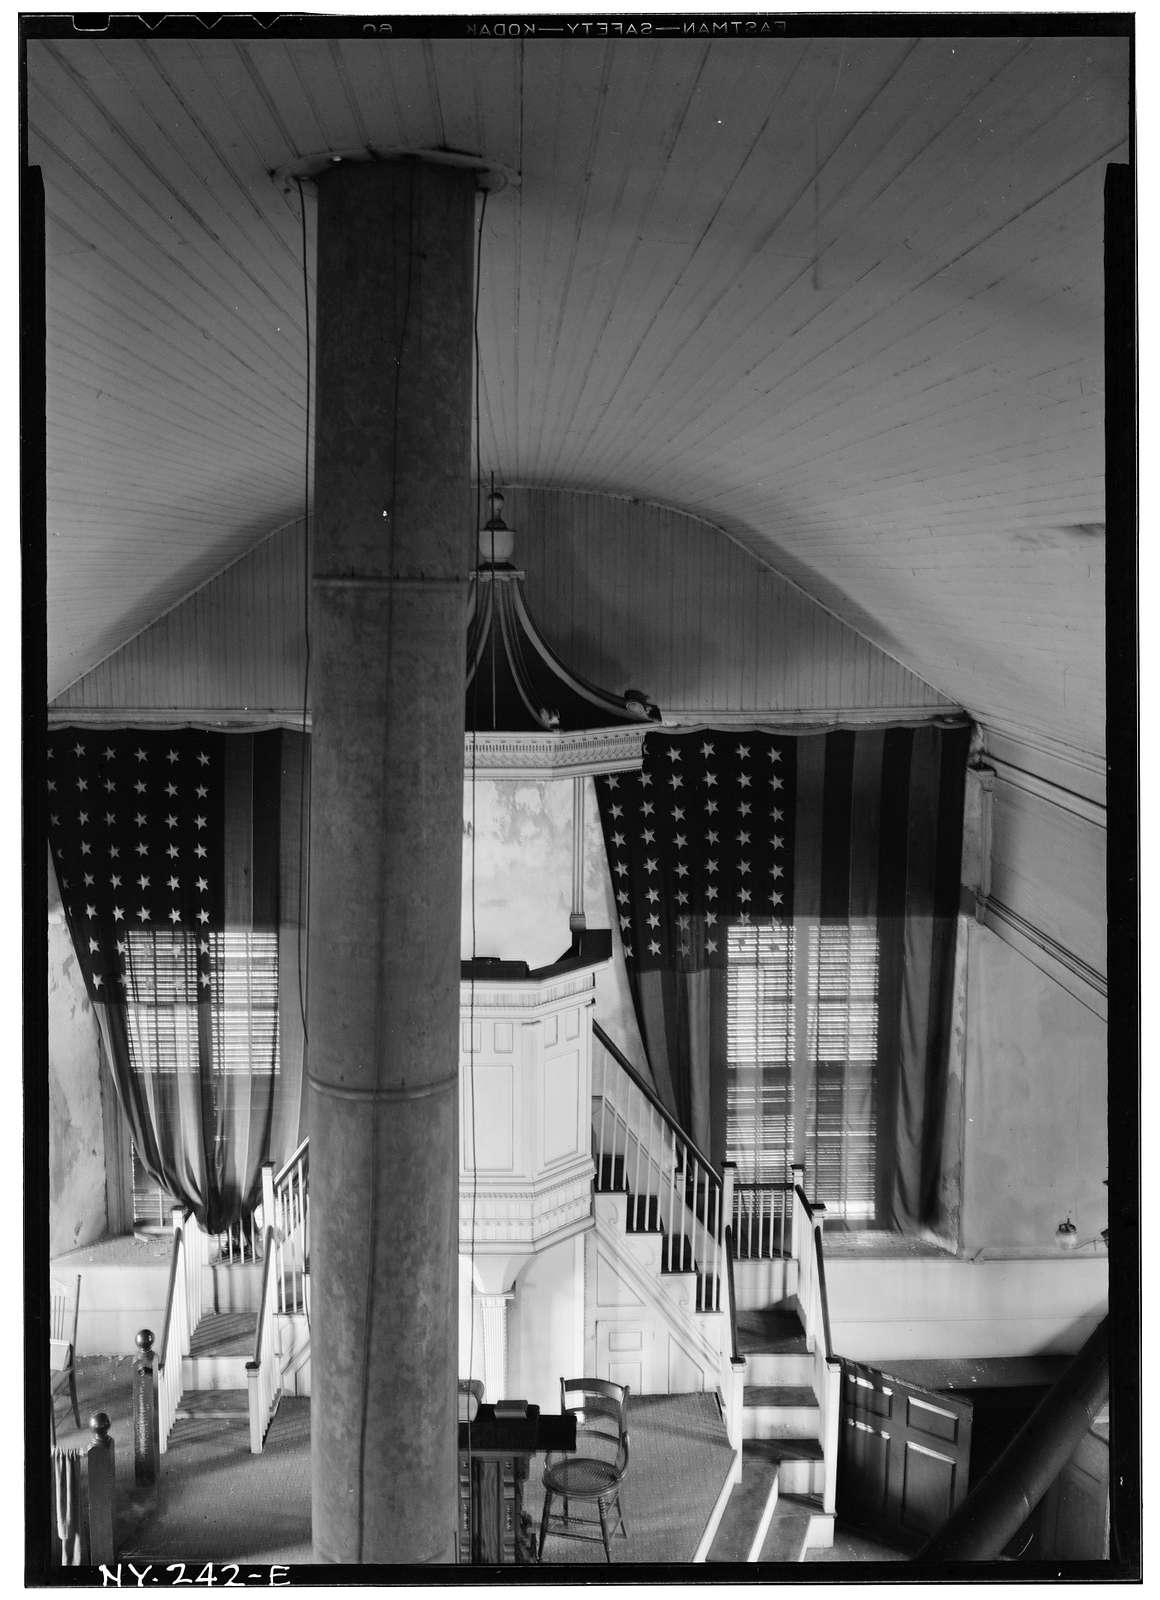 Fort Herkimer Church, Herkimer, Herkimer County, NY